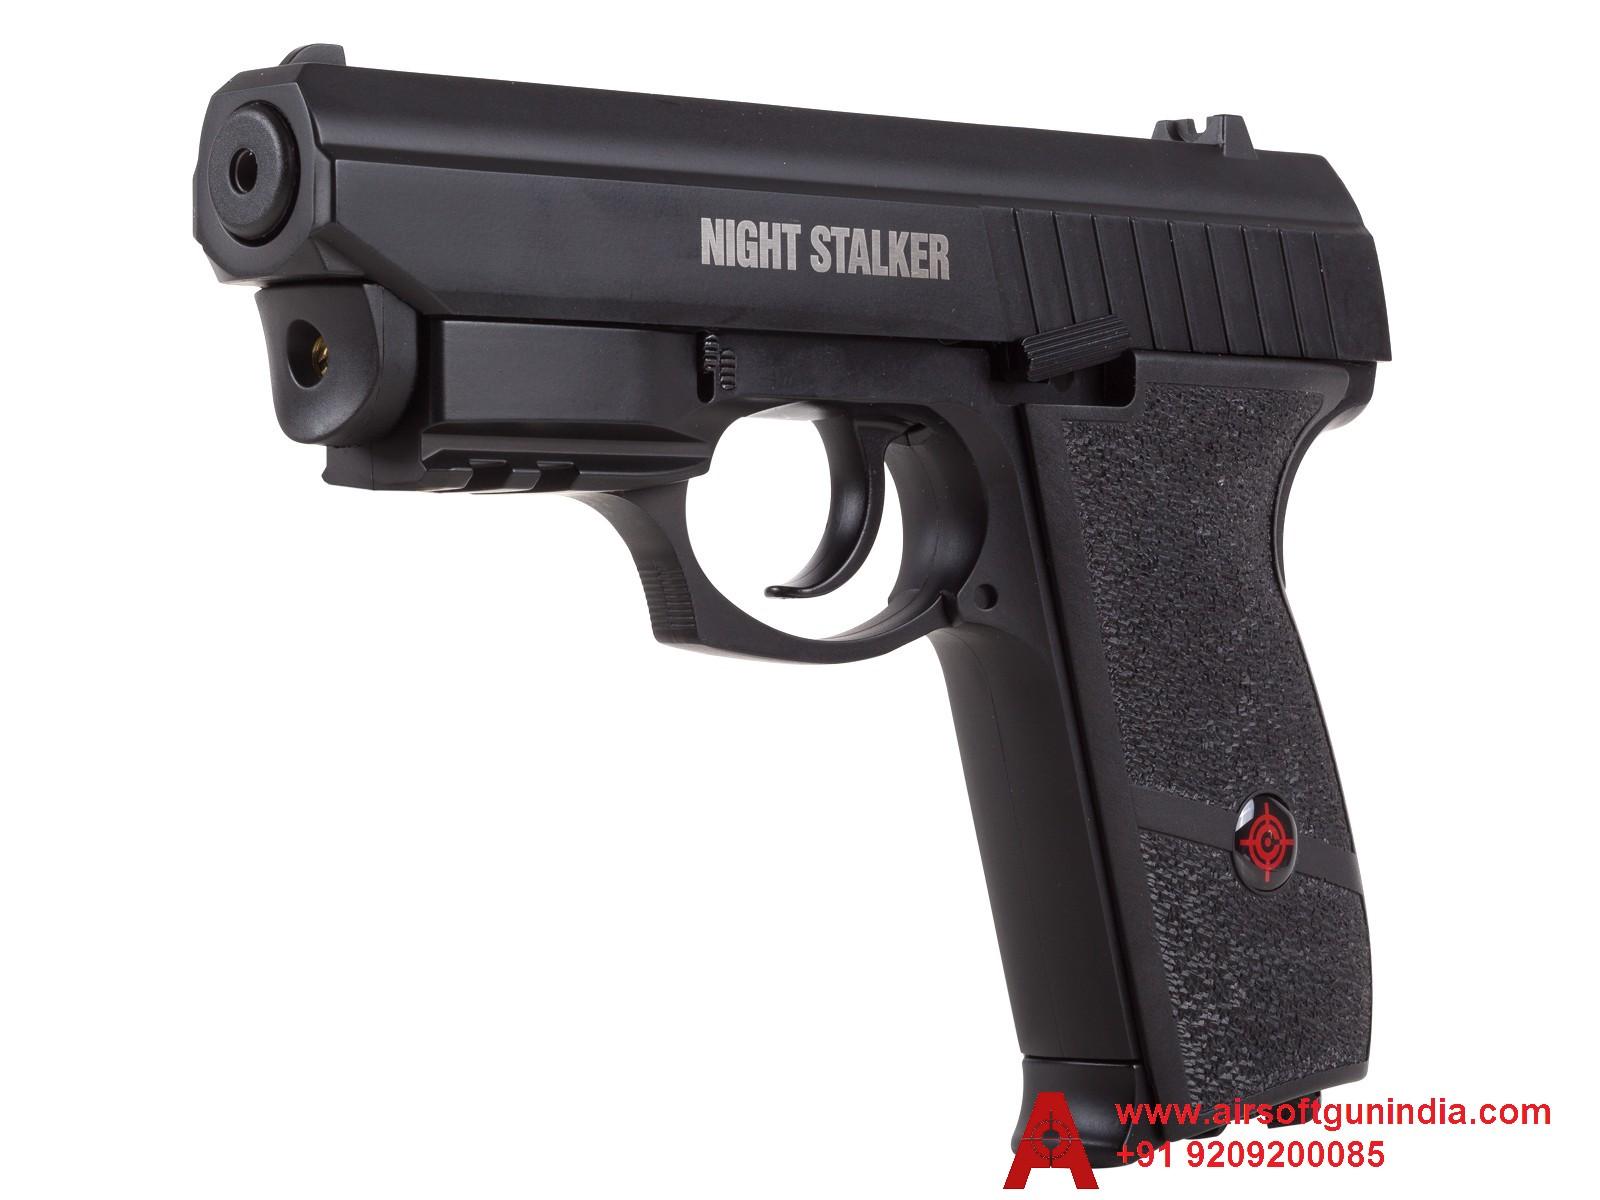 Crosman PFM520 Night Stalker CO2 Blowback Air Pistol By Airsoft Gun India